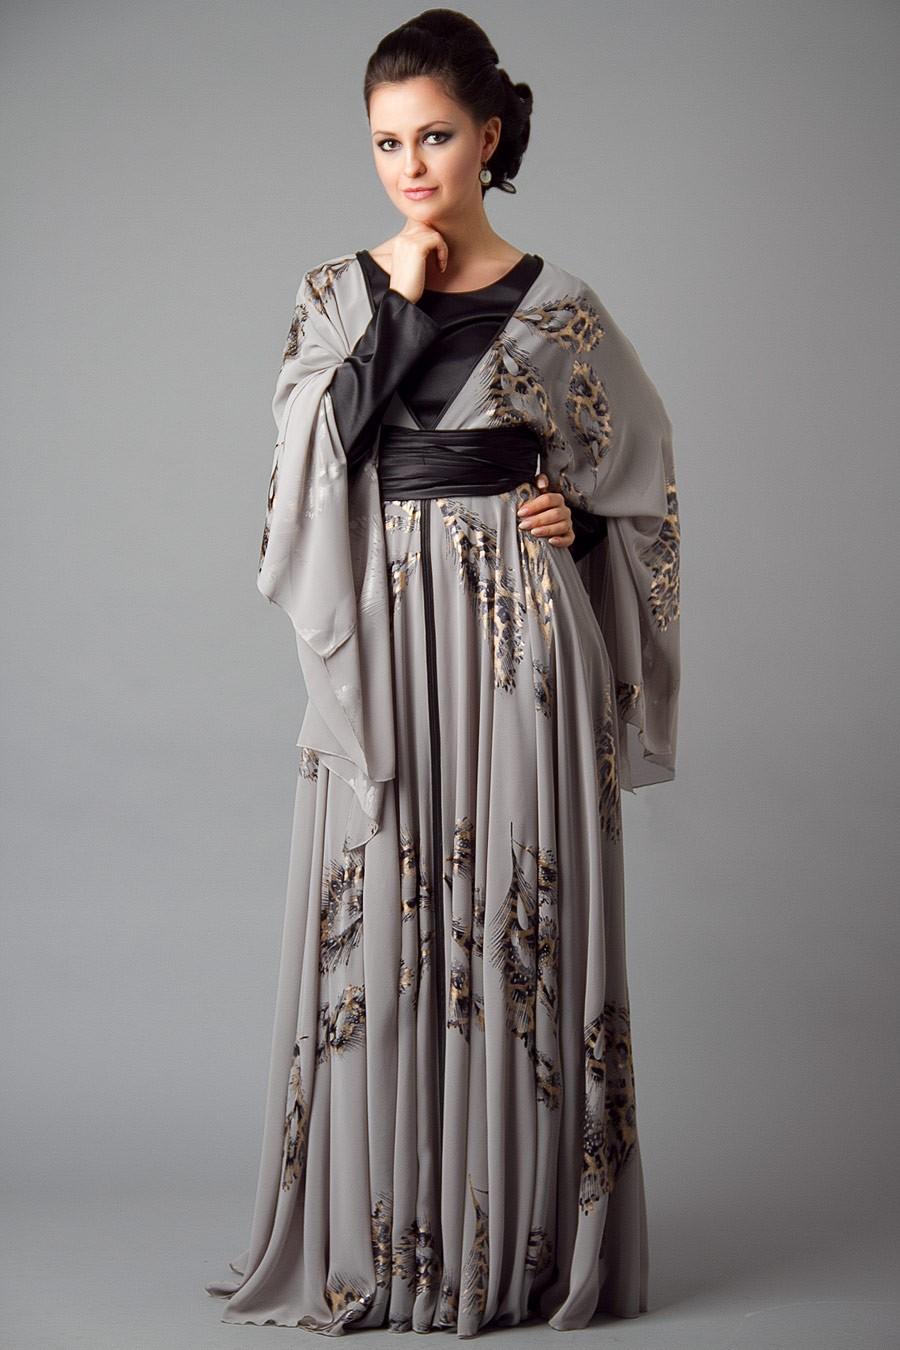 Latest Fashion For Teenage Girls Tumblr 2016 2017: Designer Embroidered Abaya Collection 2013-2014